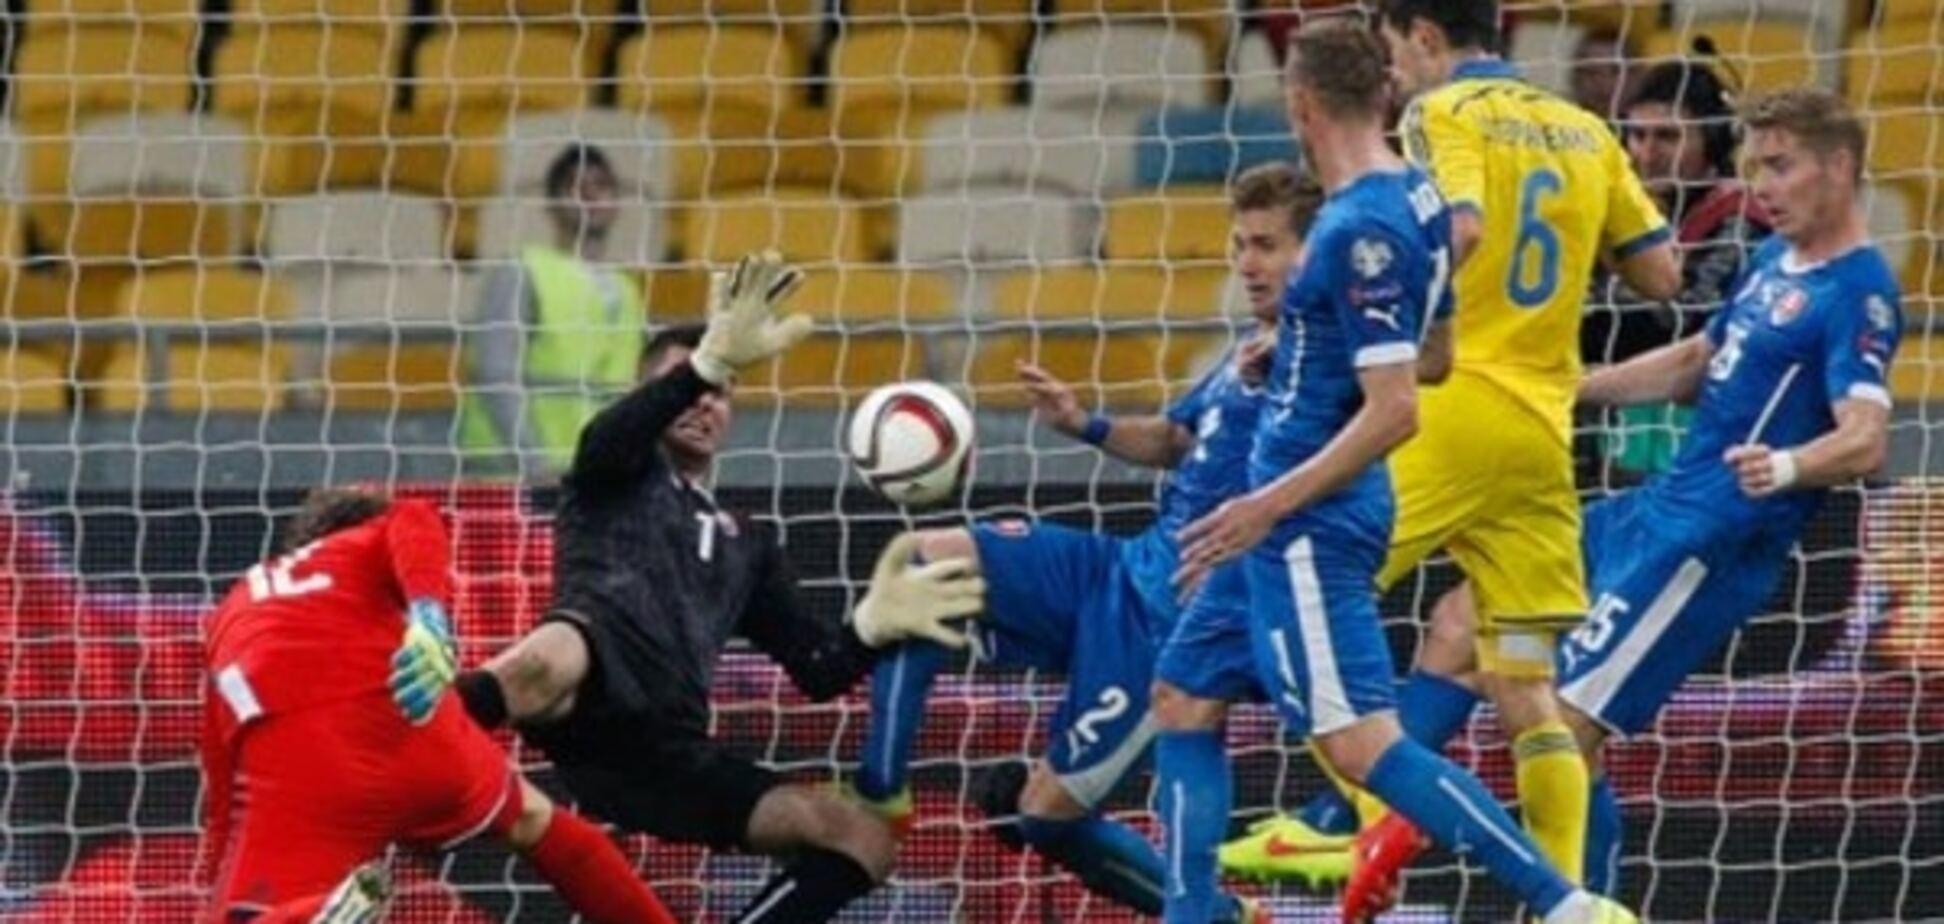 Словаччина - Україна: анонс, прогноз, де дивитися матч Євро-2016